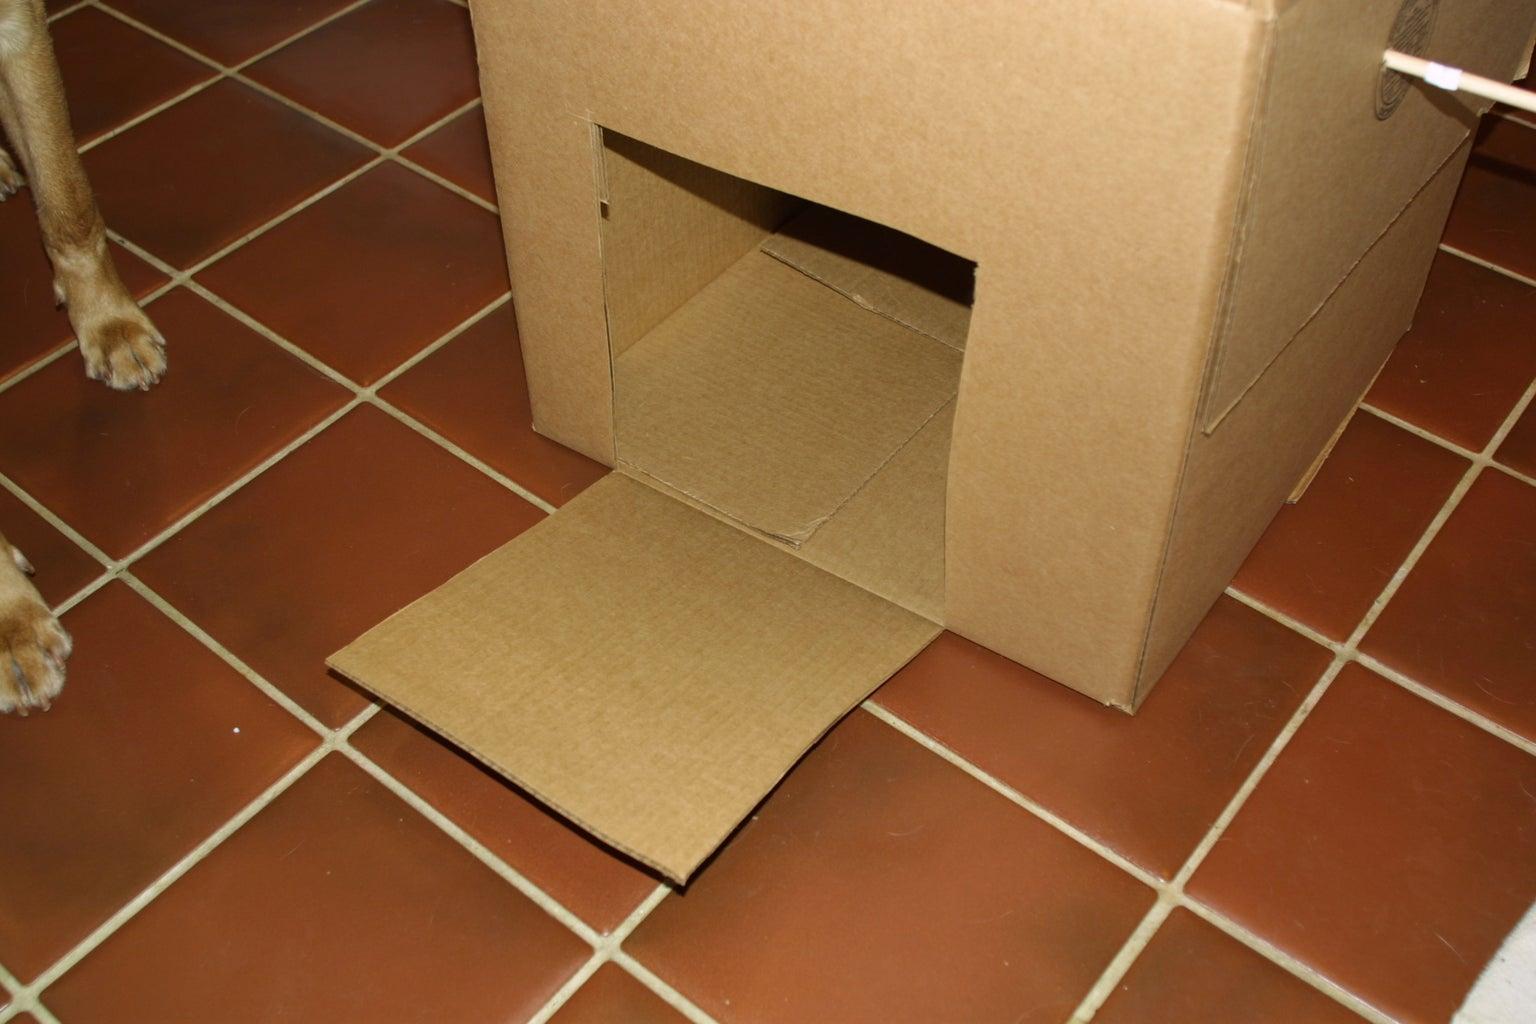 Get a Cardboard Box